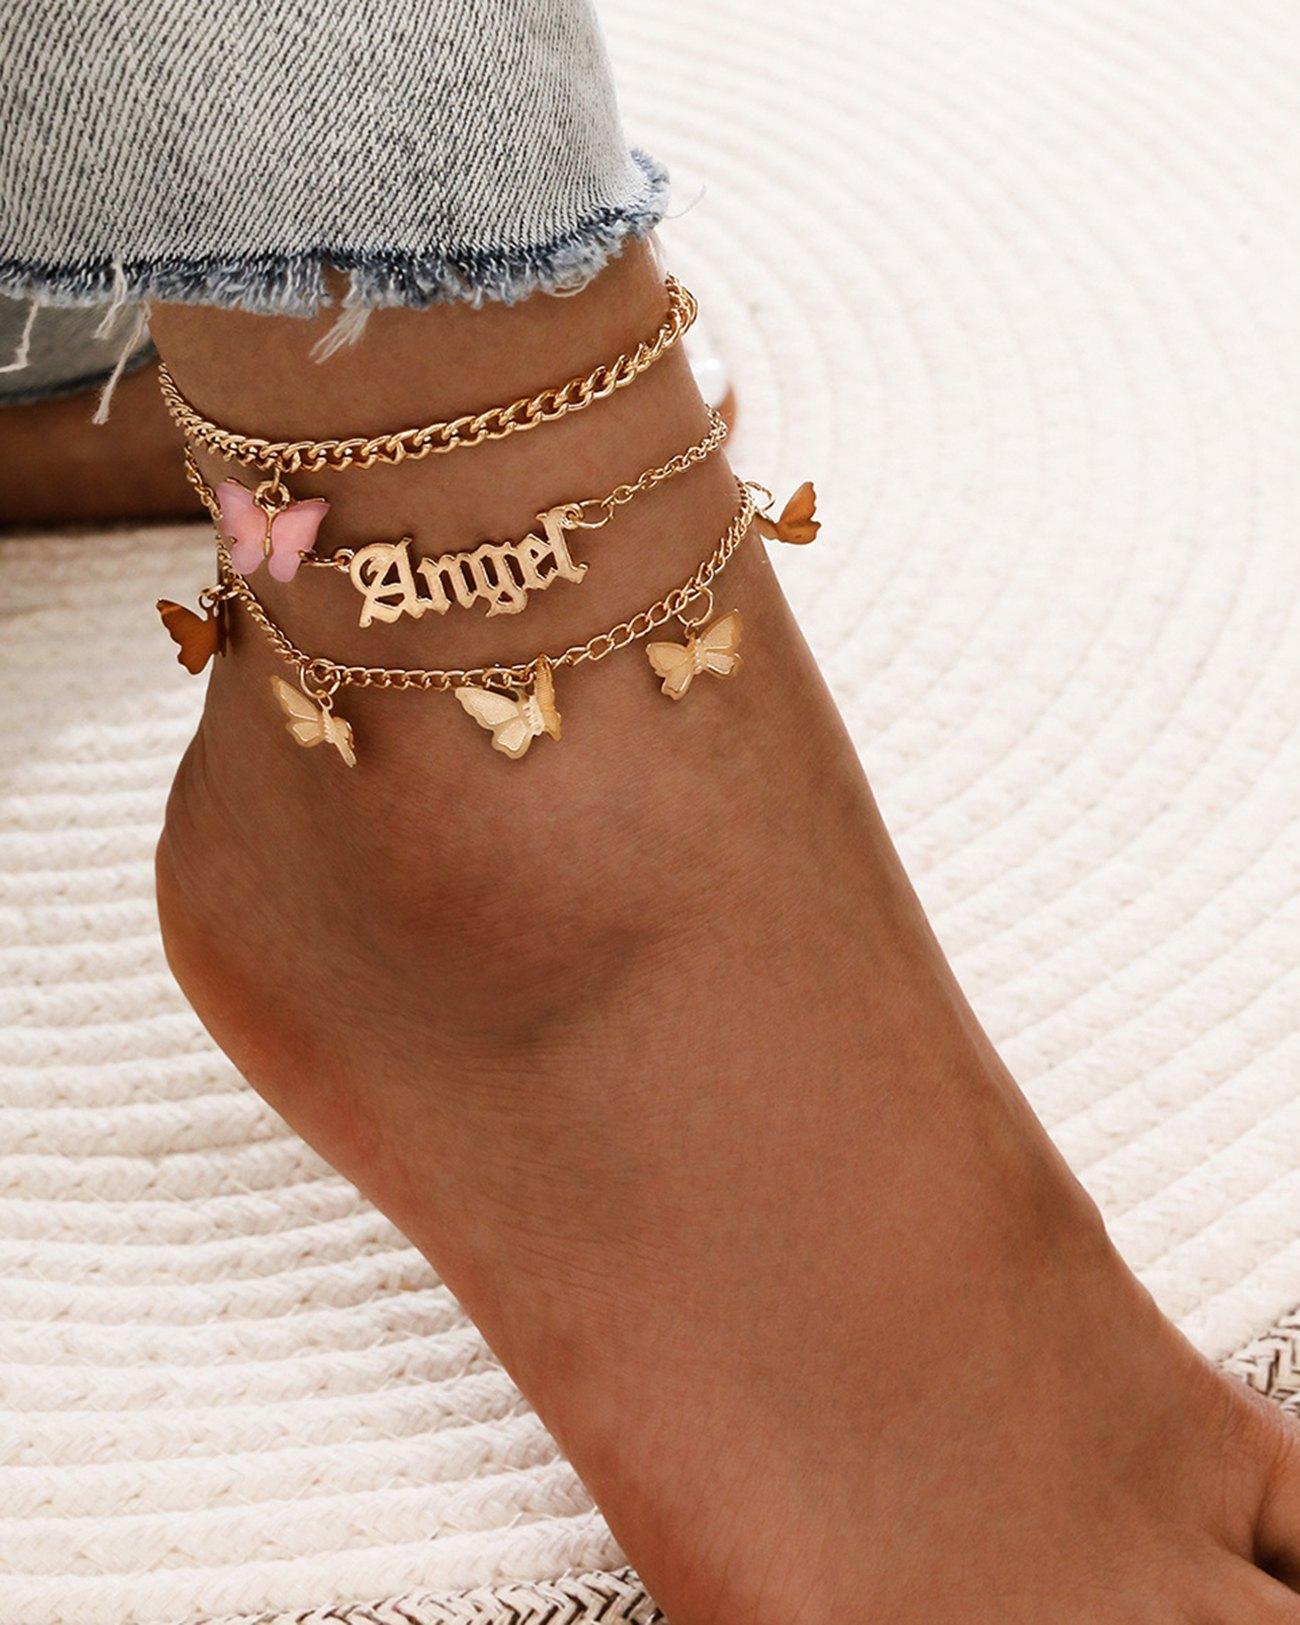 3Pcs Butterfly Decor Anklet - Golden ONE SIZE